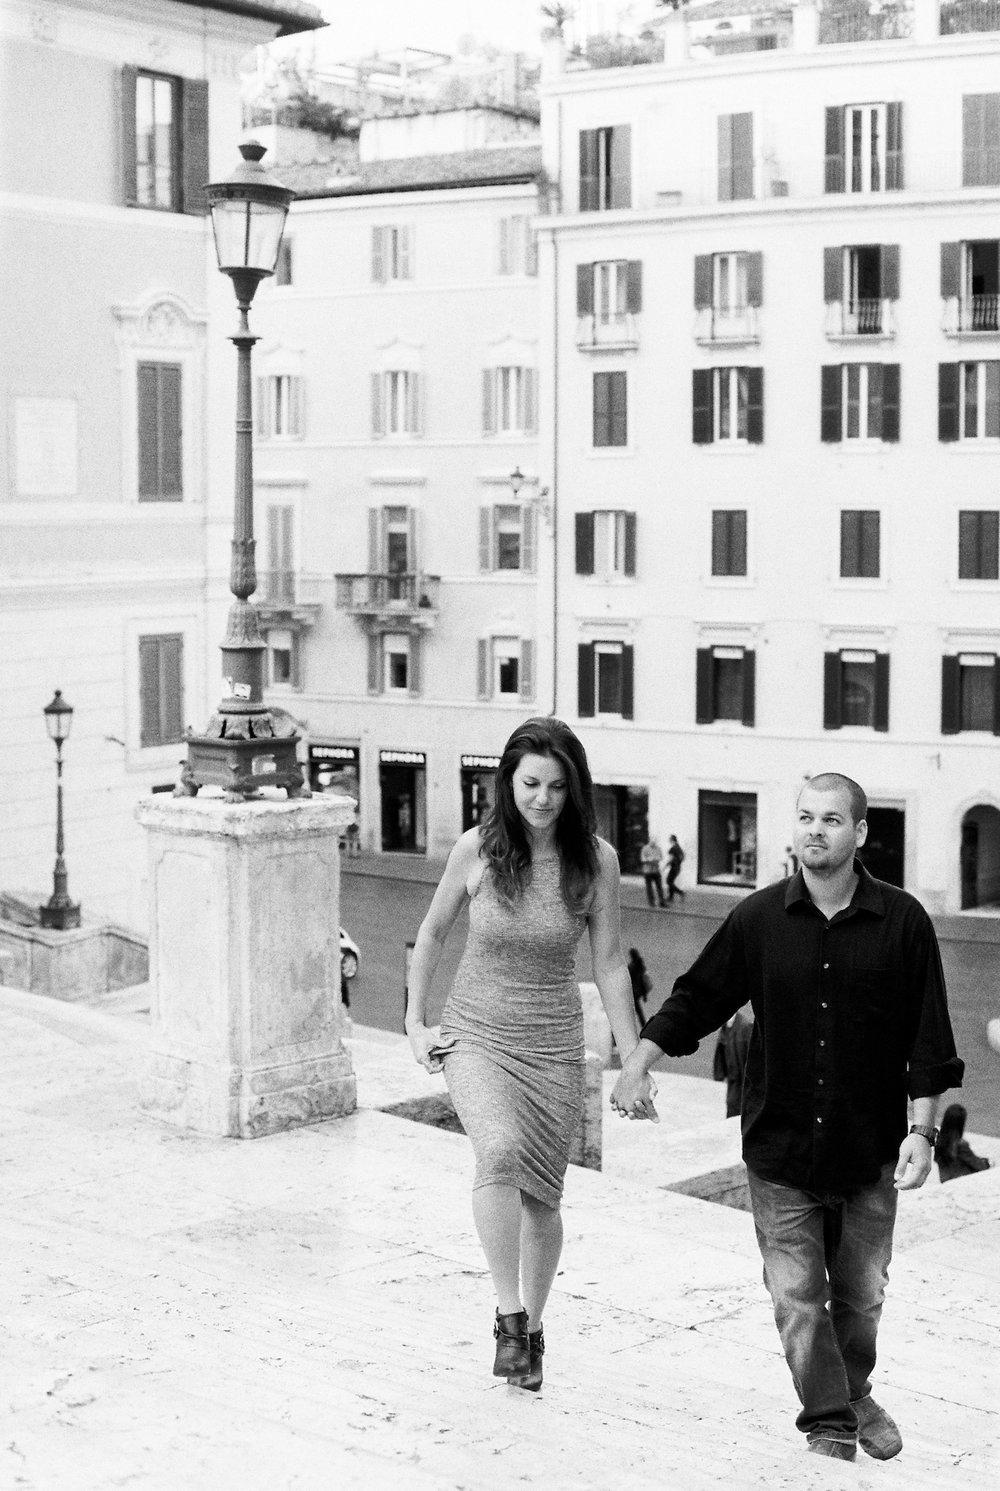 Photo taken by the talented Sergio Serrintino